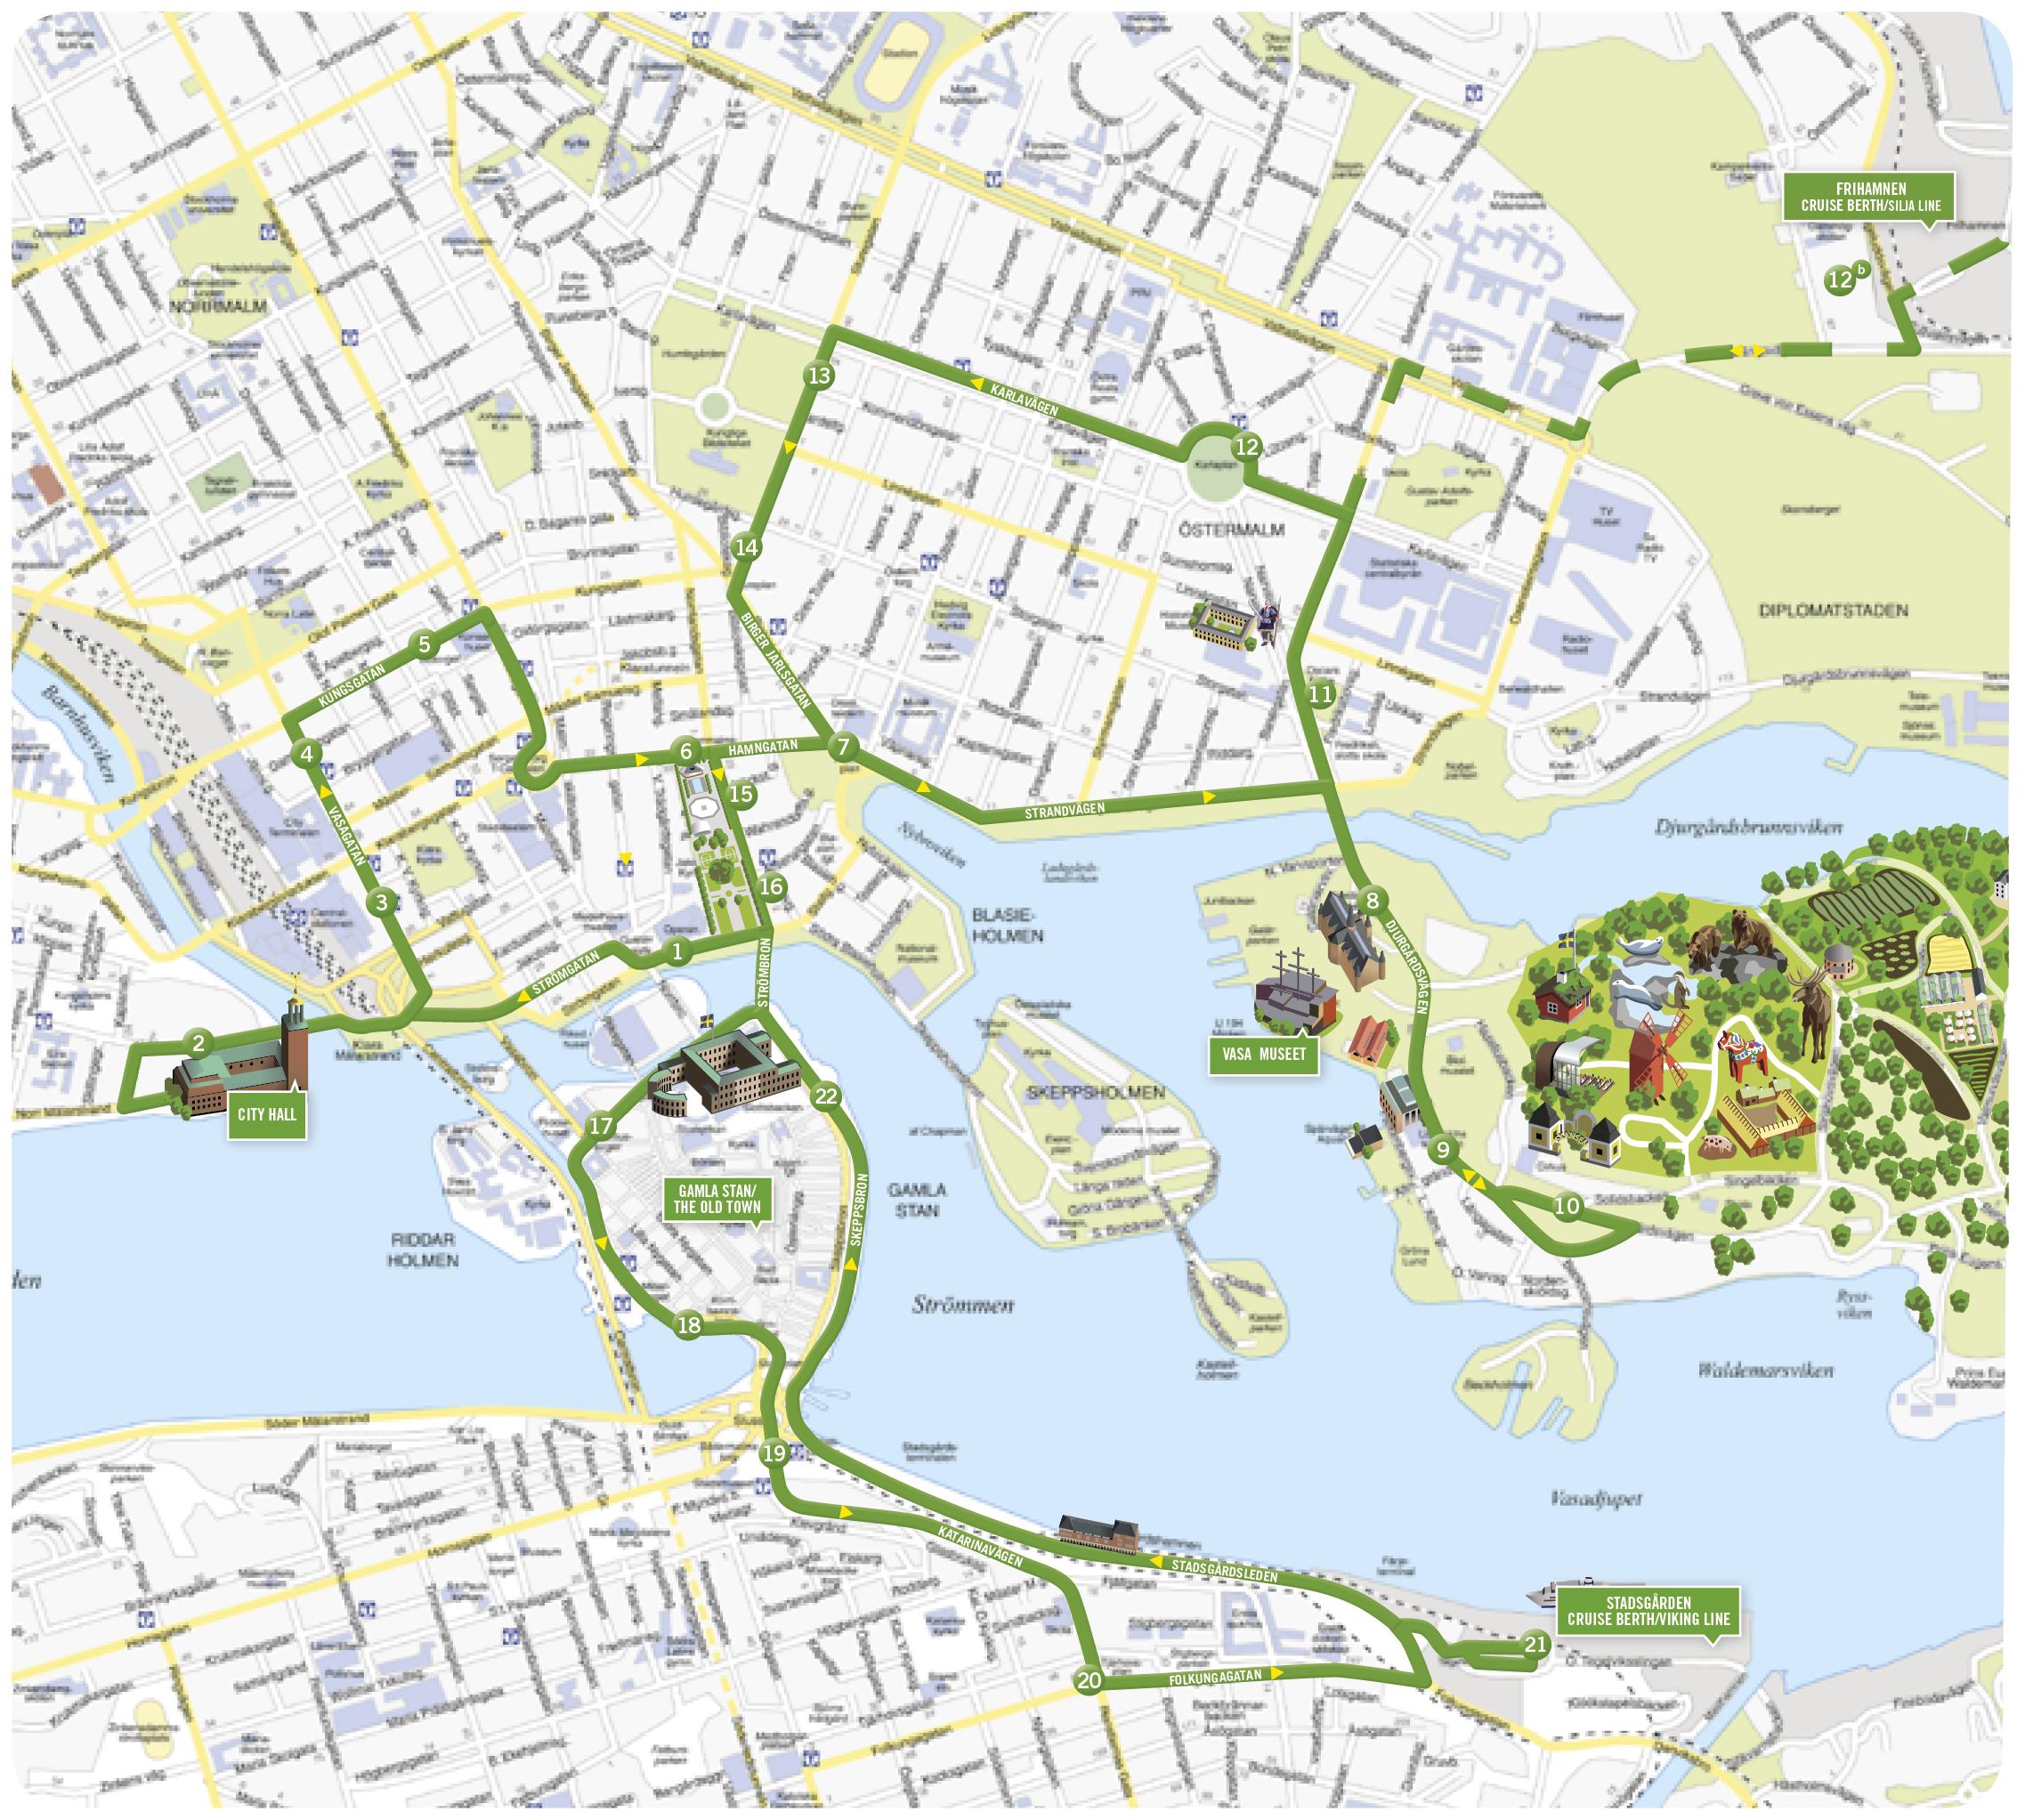 äldre svensk porr stockholm city karta